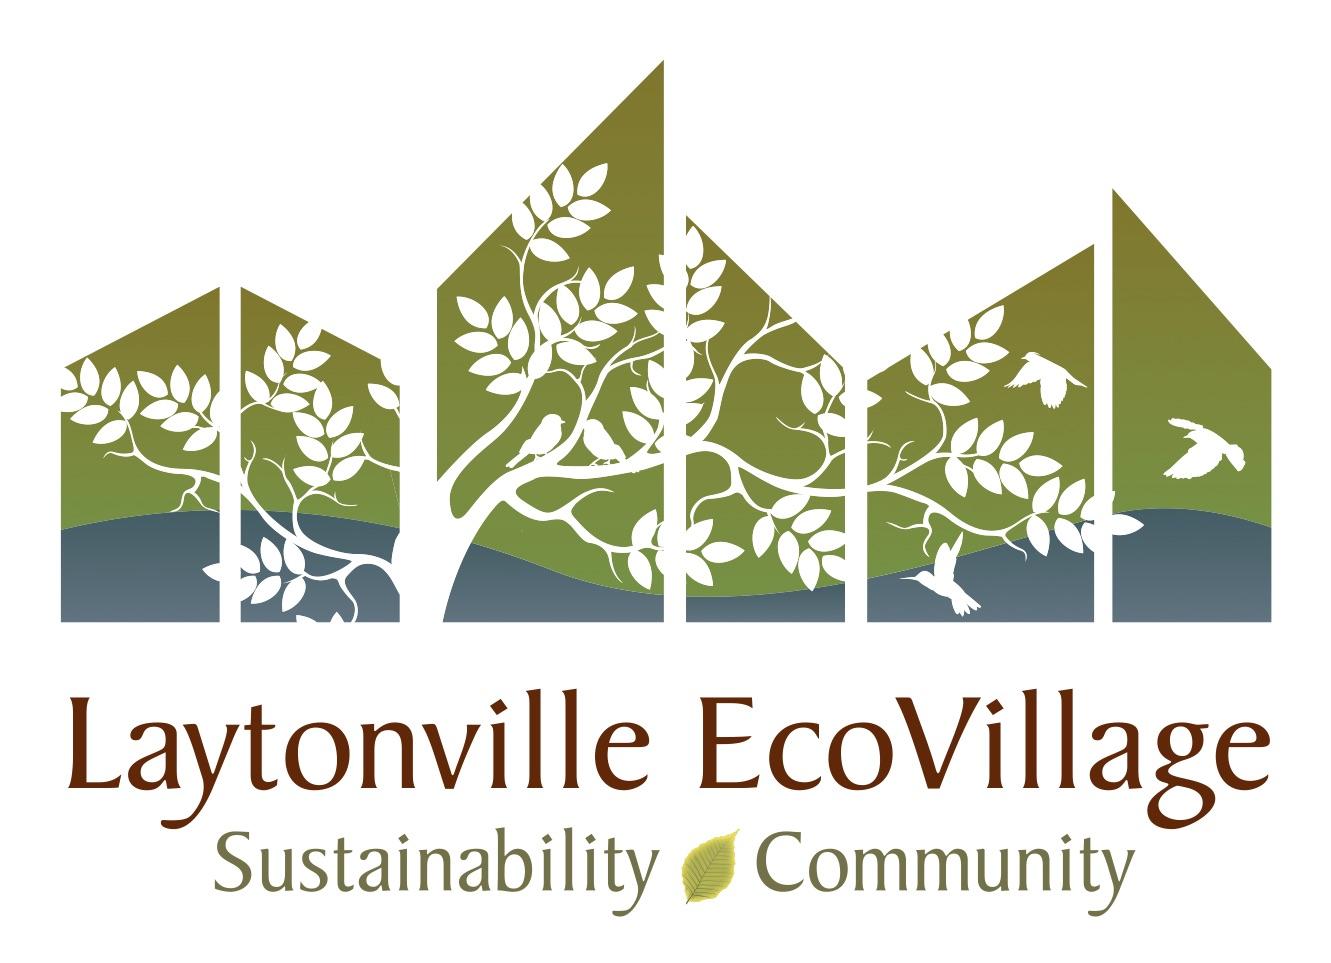 Laytonville EcoVillage